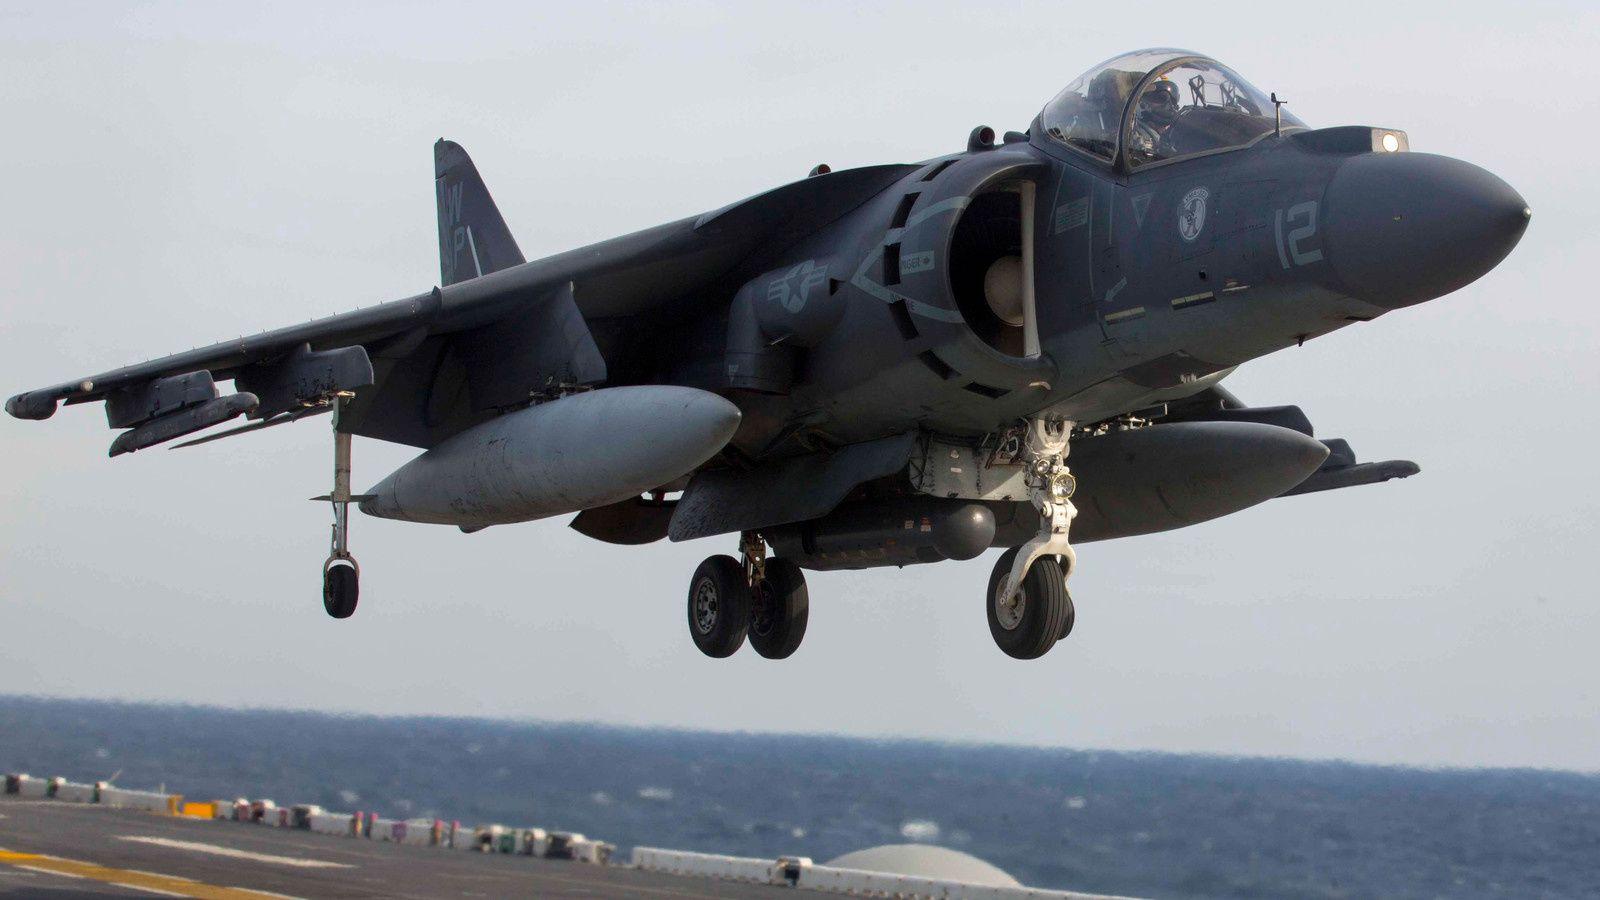 Un AV-8B Harrier II de l'US Marine Corps s'abîme dans l'océan Atlantique